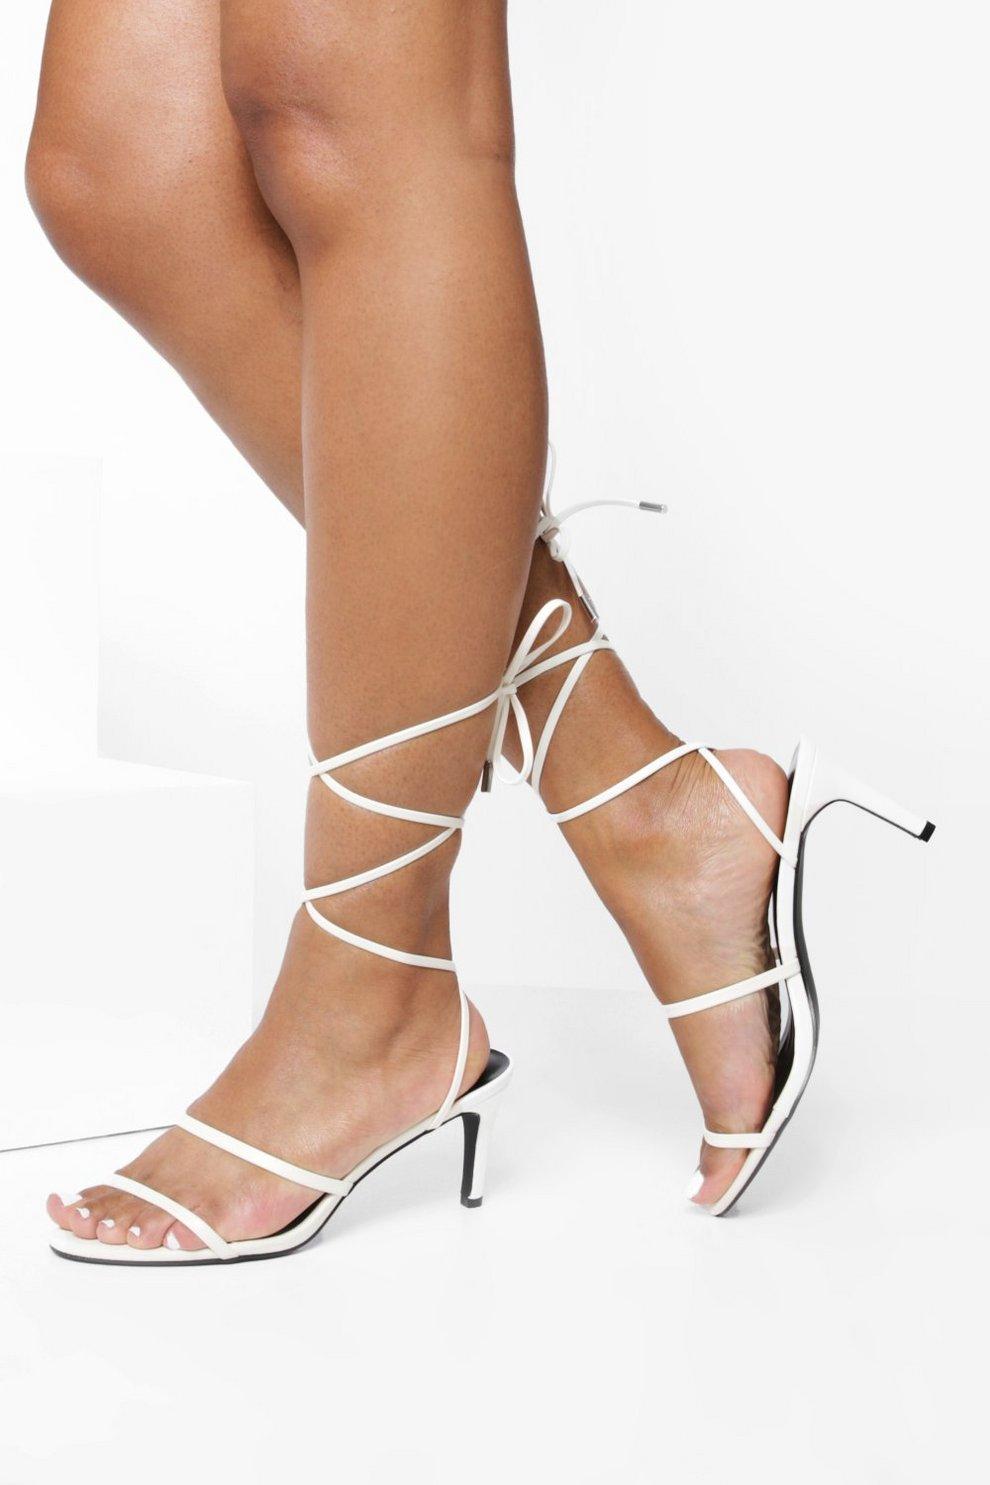 Sandals Low Skinny Heel Sandals Strap Skinny Low Strap Strap Low Heel Skinny R354AjqL